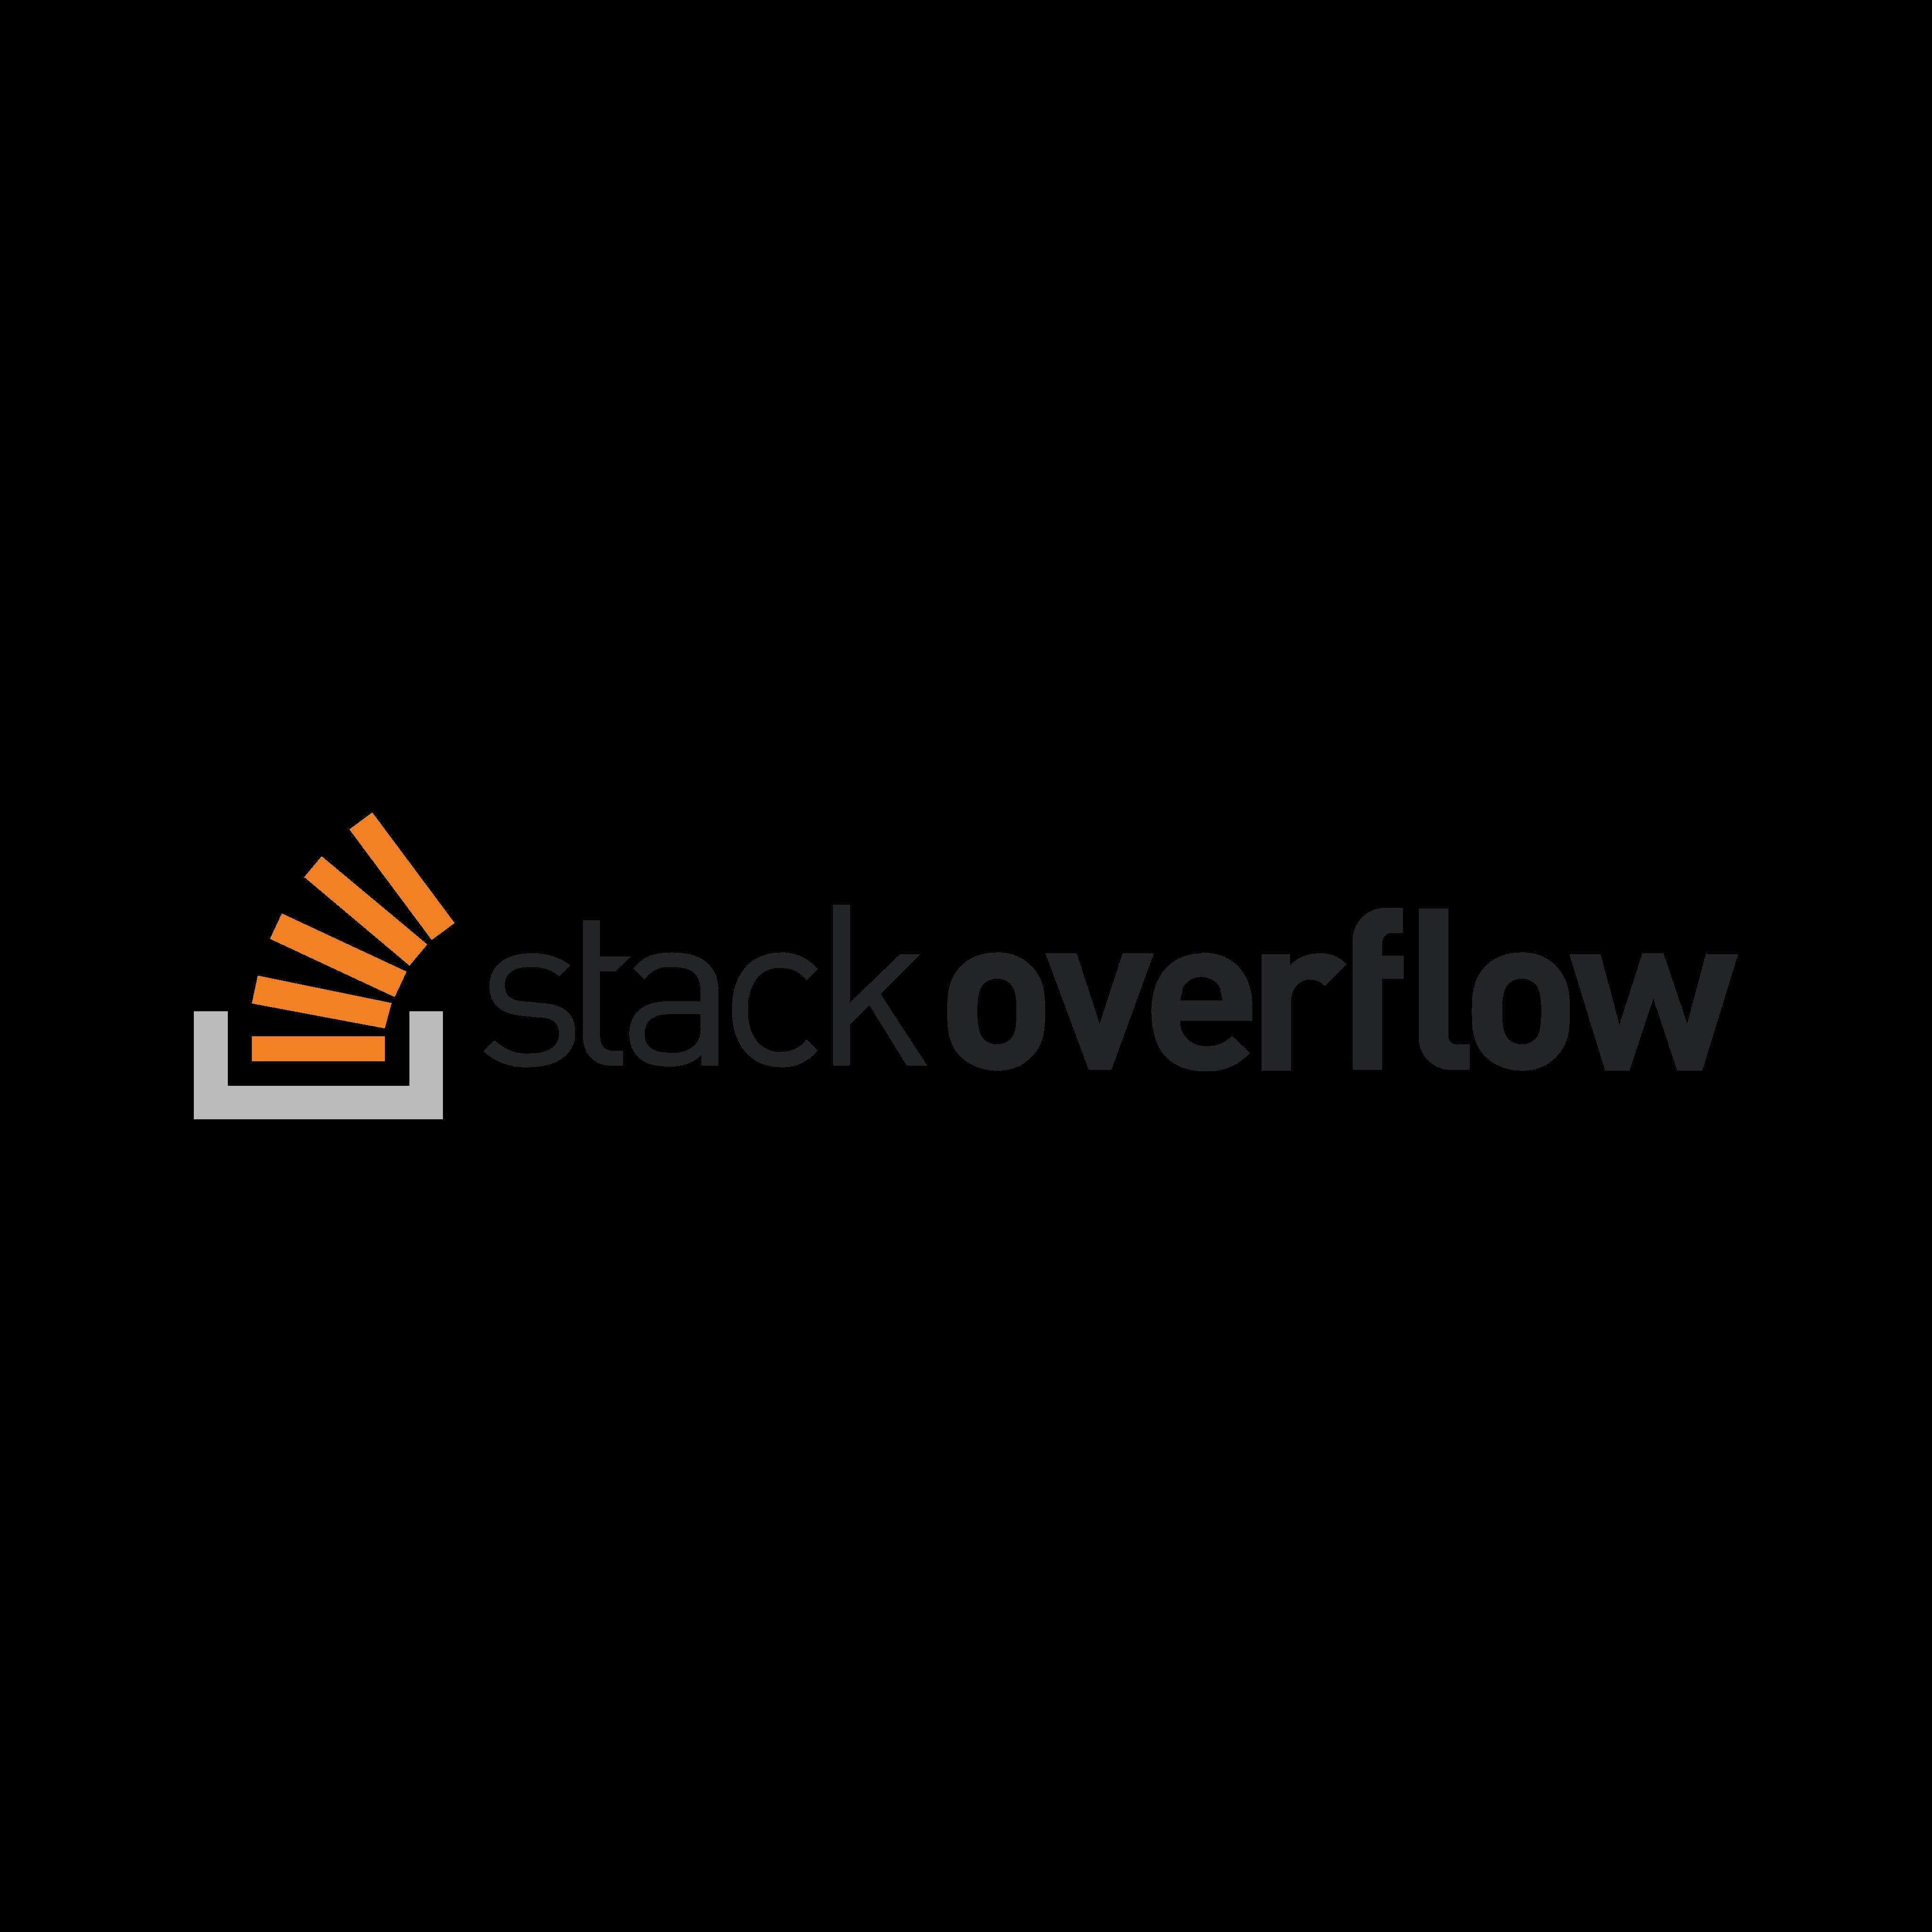 stack overflow logo 0 - Stack Overflow Logo